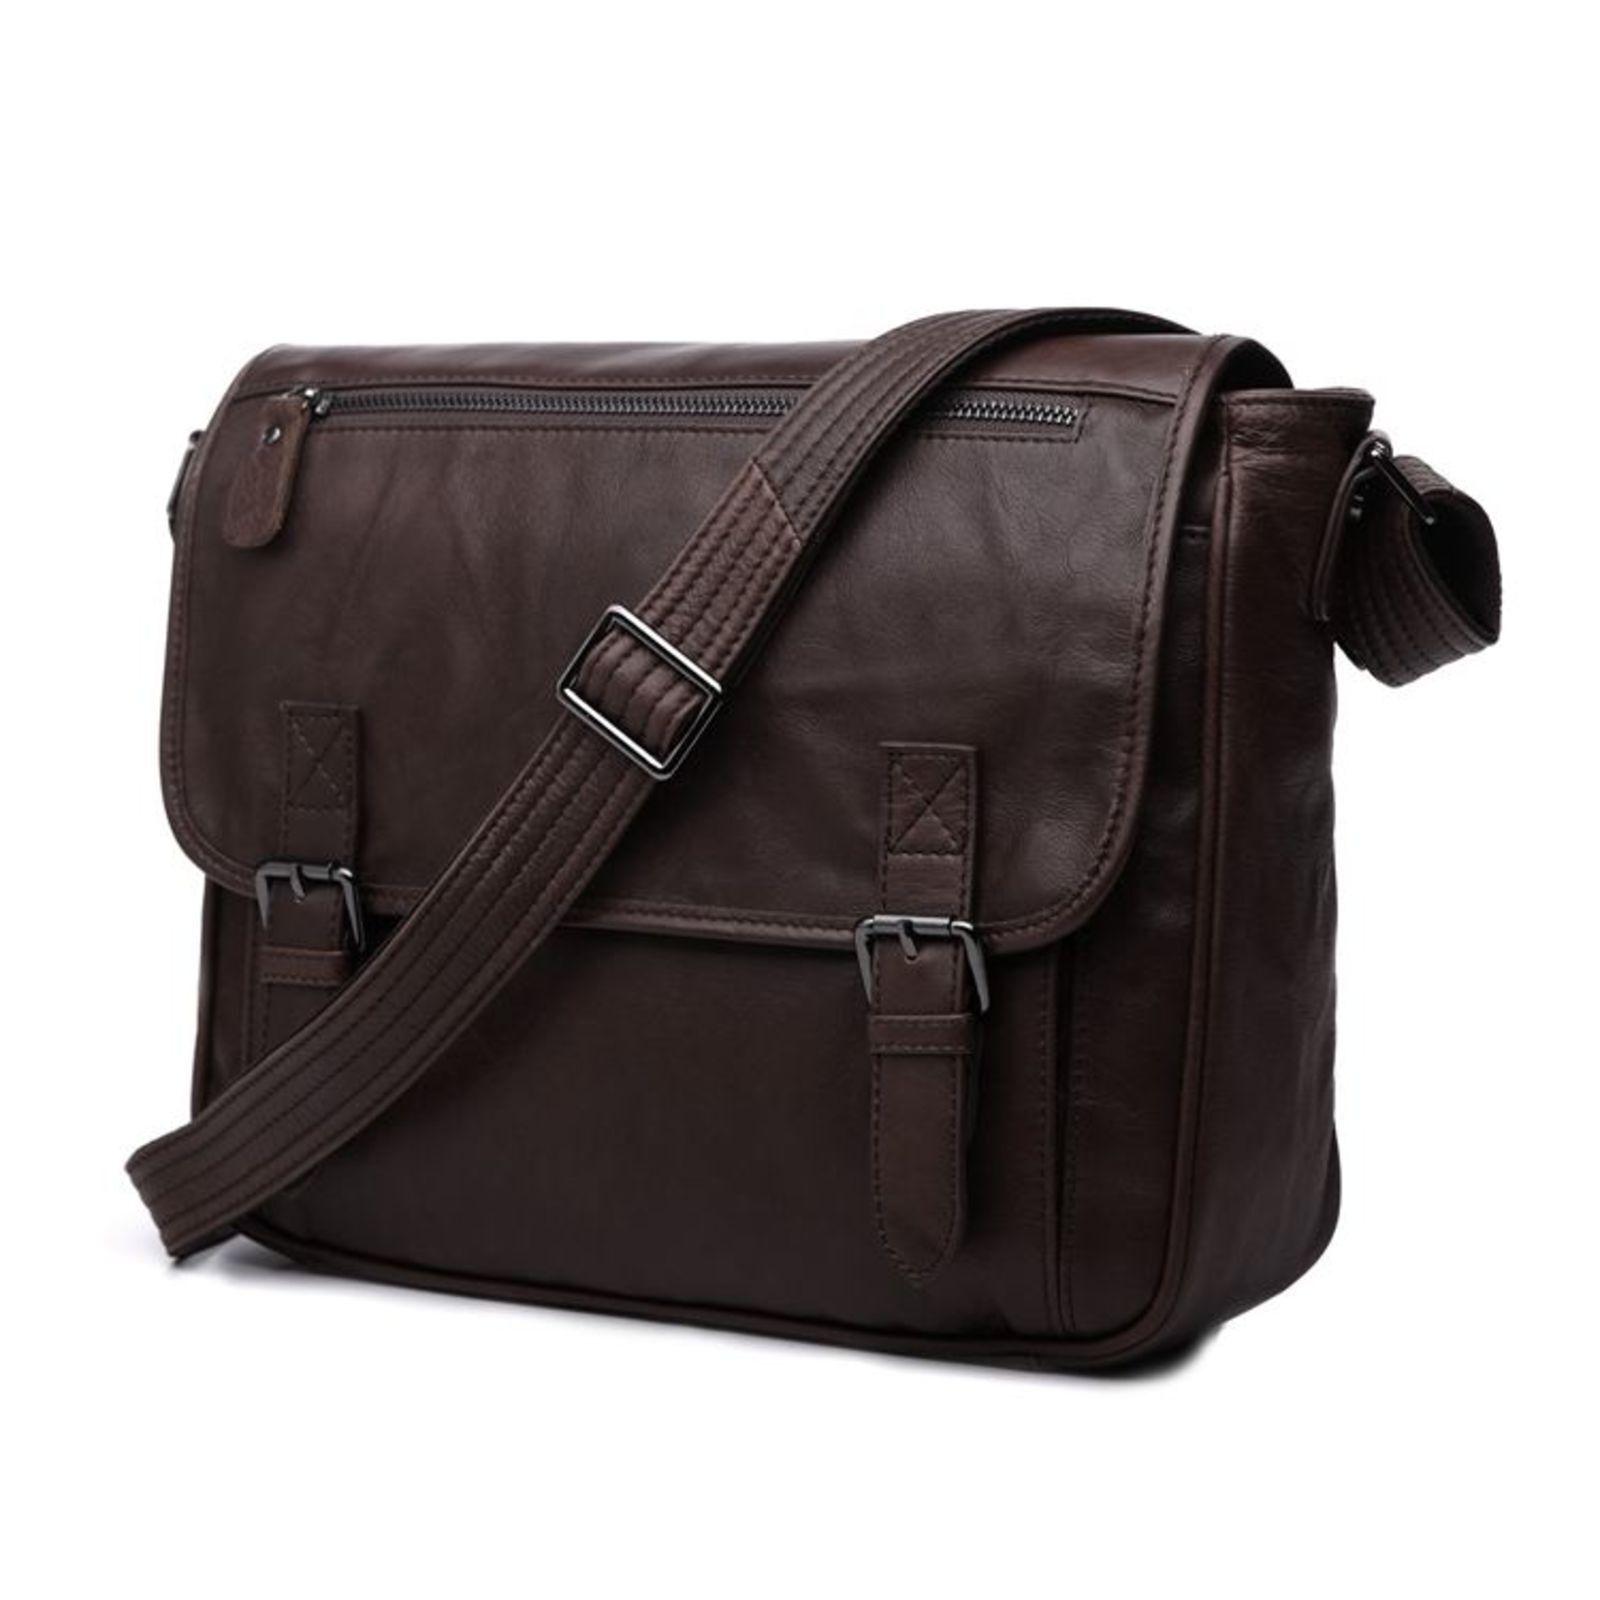 Delton Bags Sac type Messenger en cuir